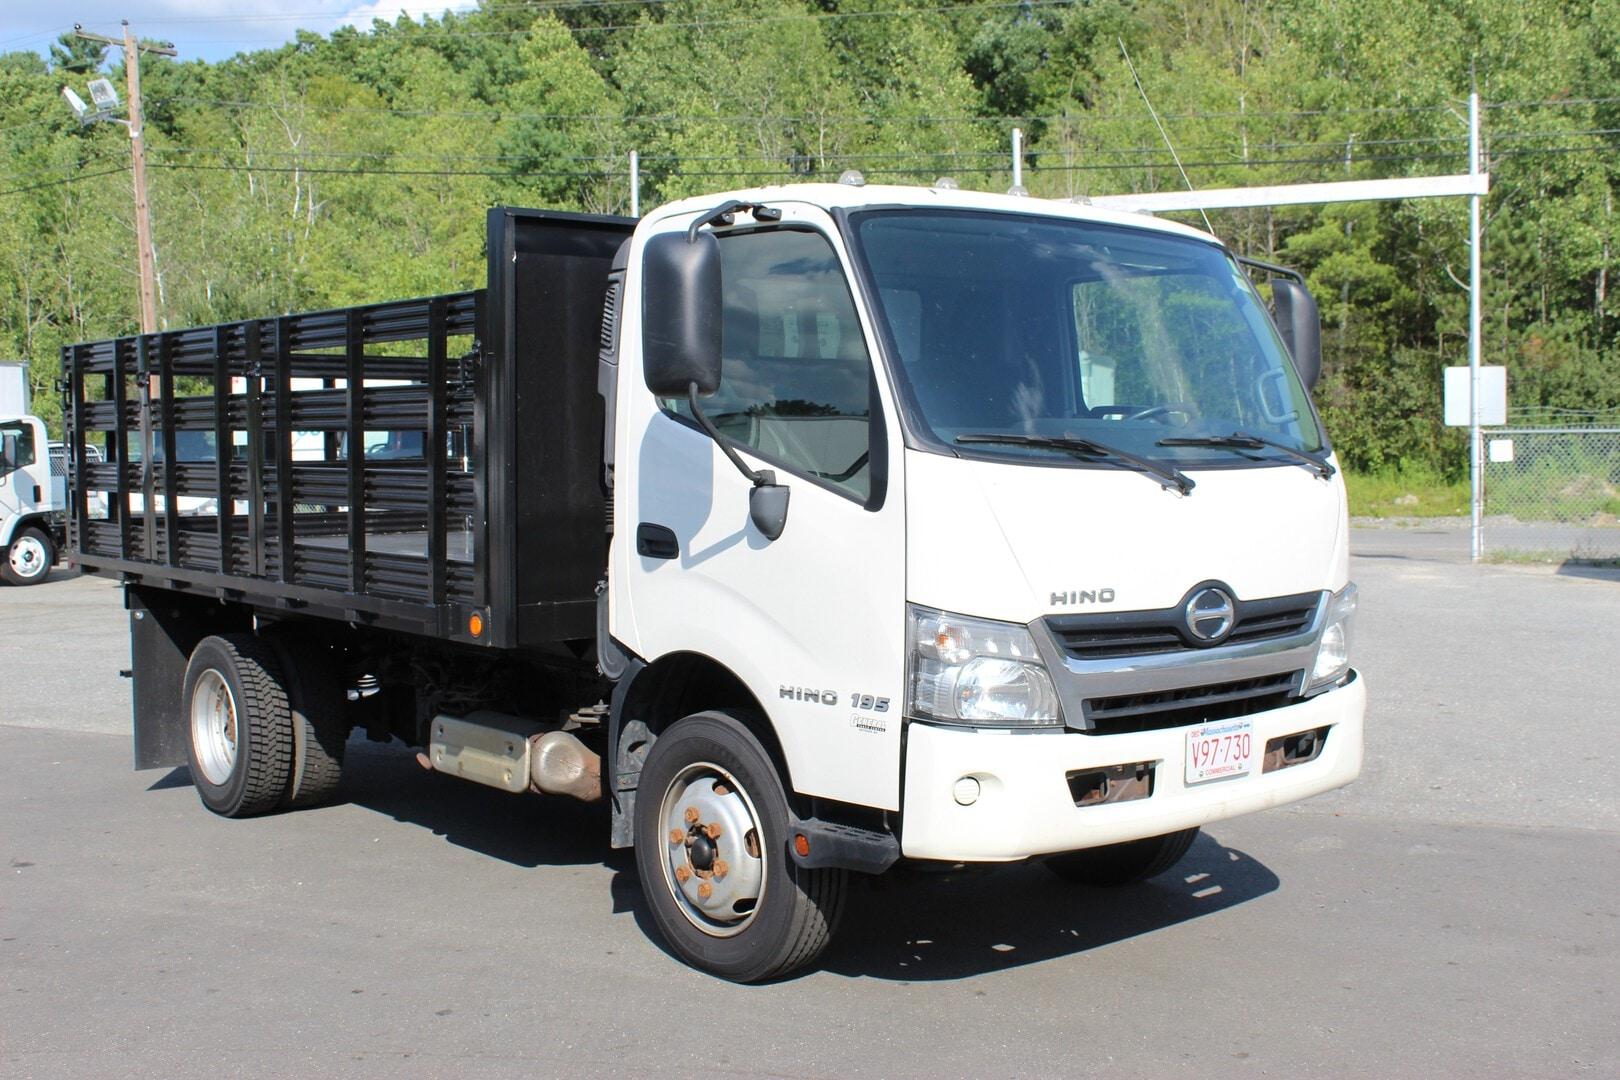 Used, 2016, Hino, 195, Cab / Chassis Trucks